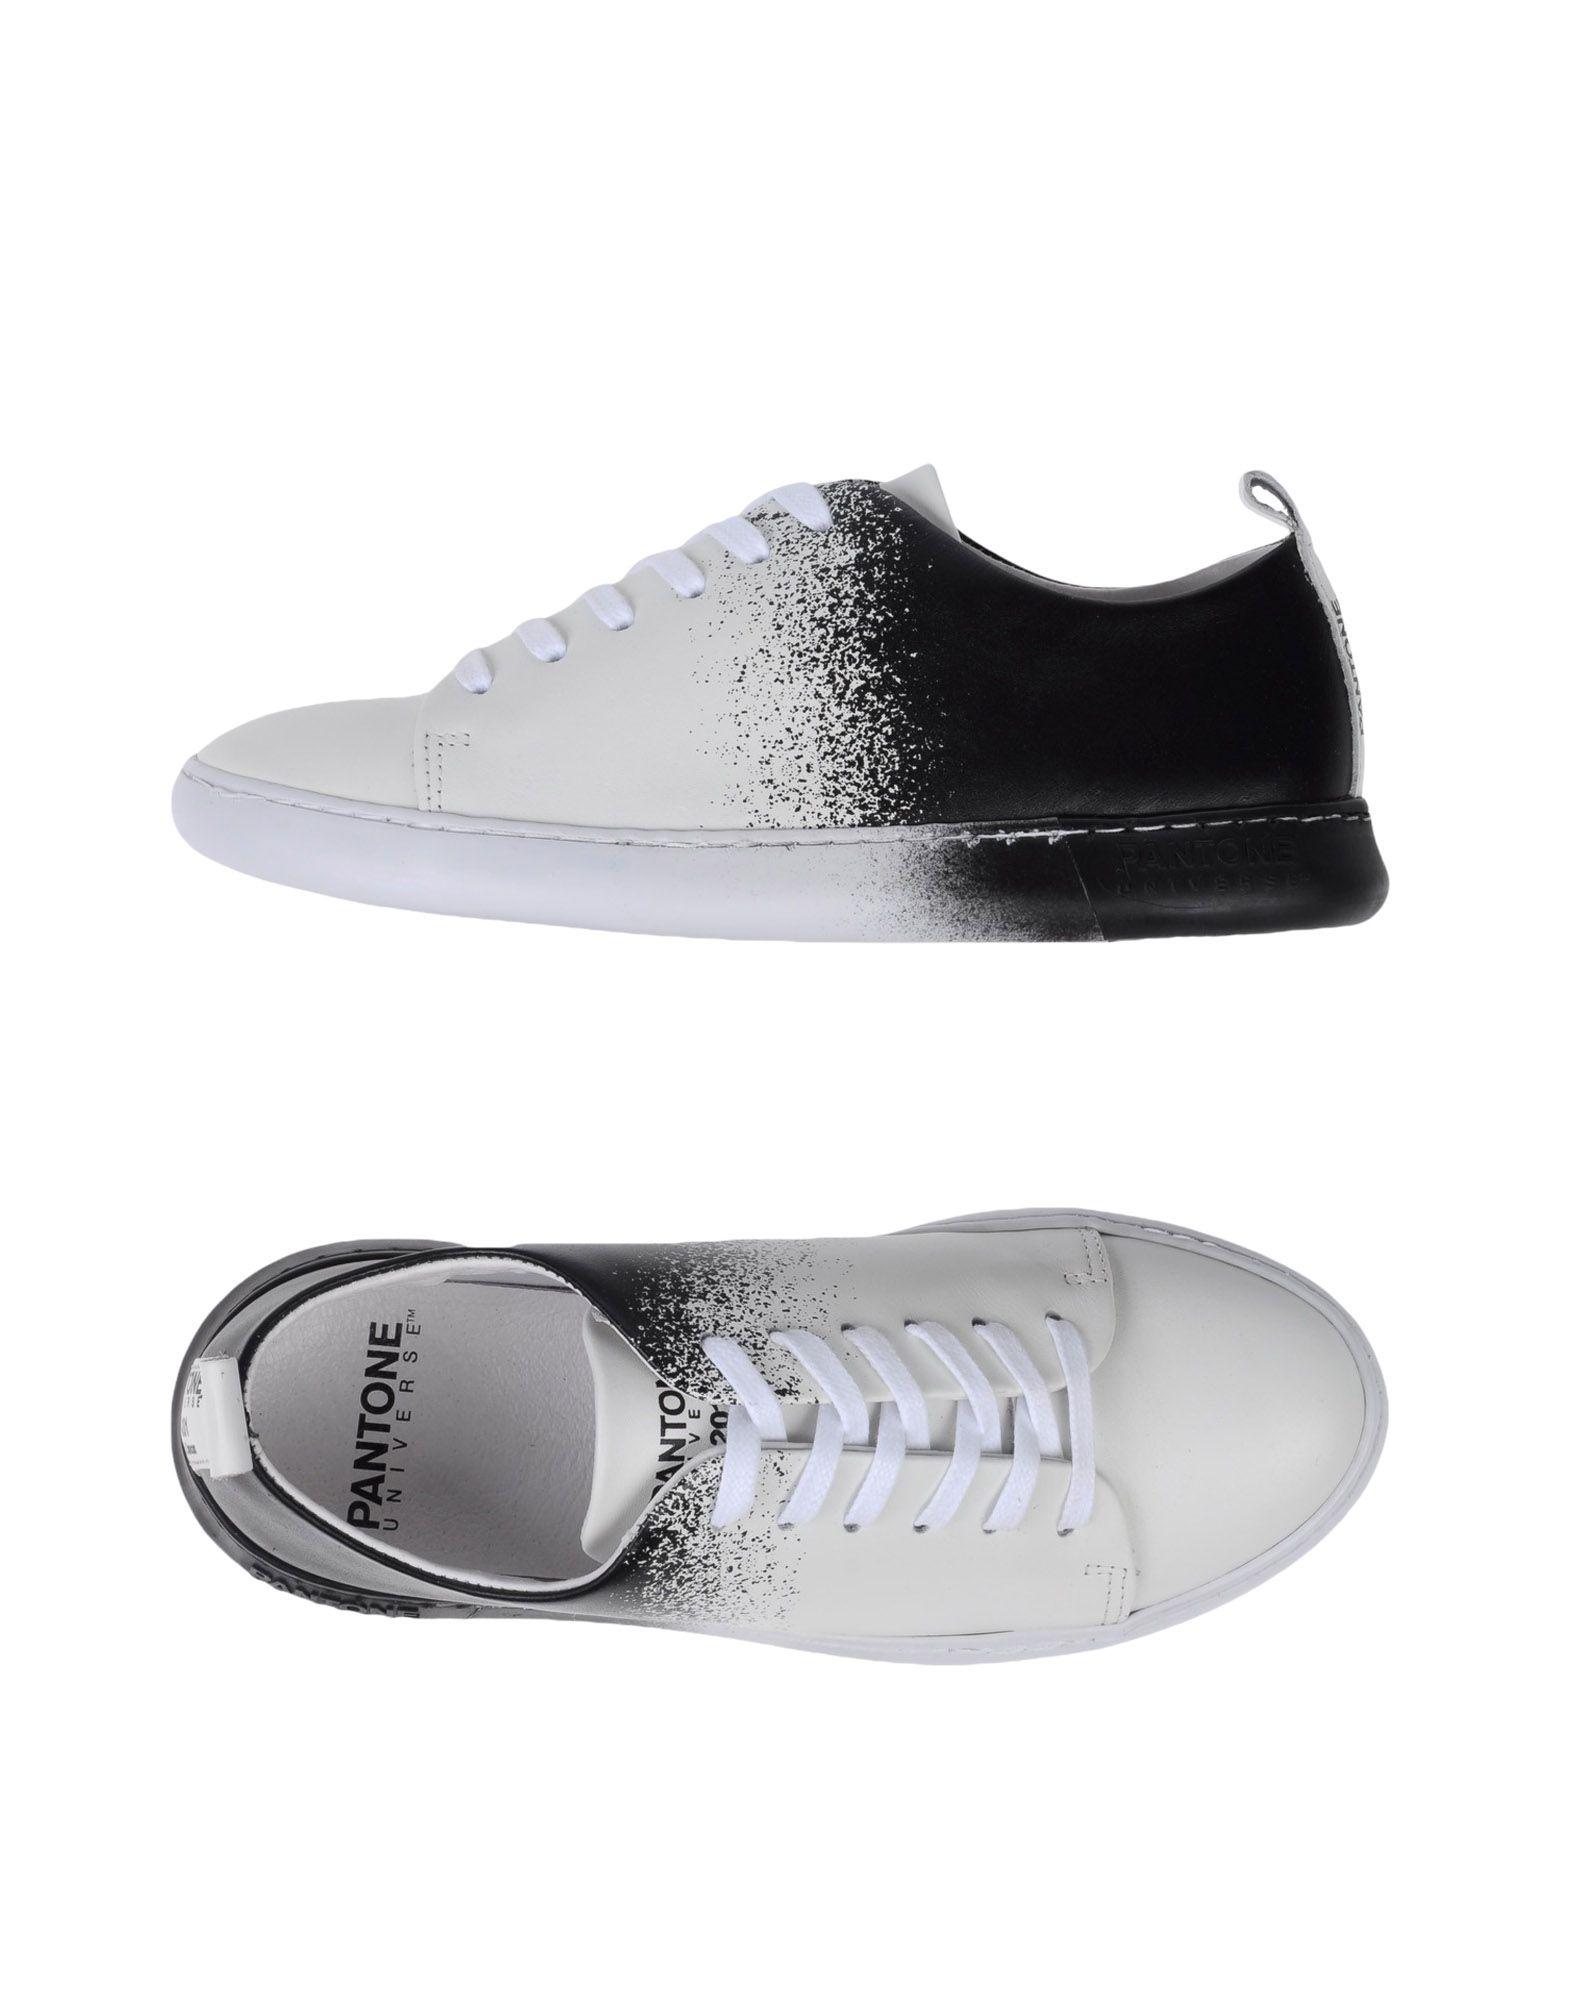 PANTONE UNIVERSE FOOTWEAR Низкие кеды и кроссовки 2017 newest pantone pastel